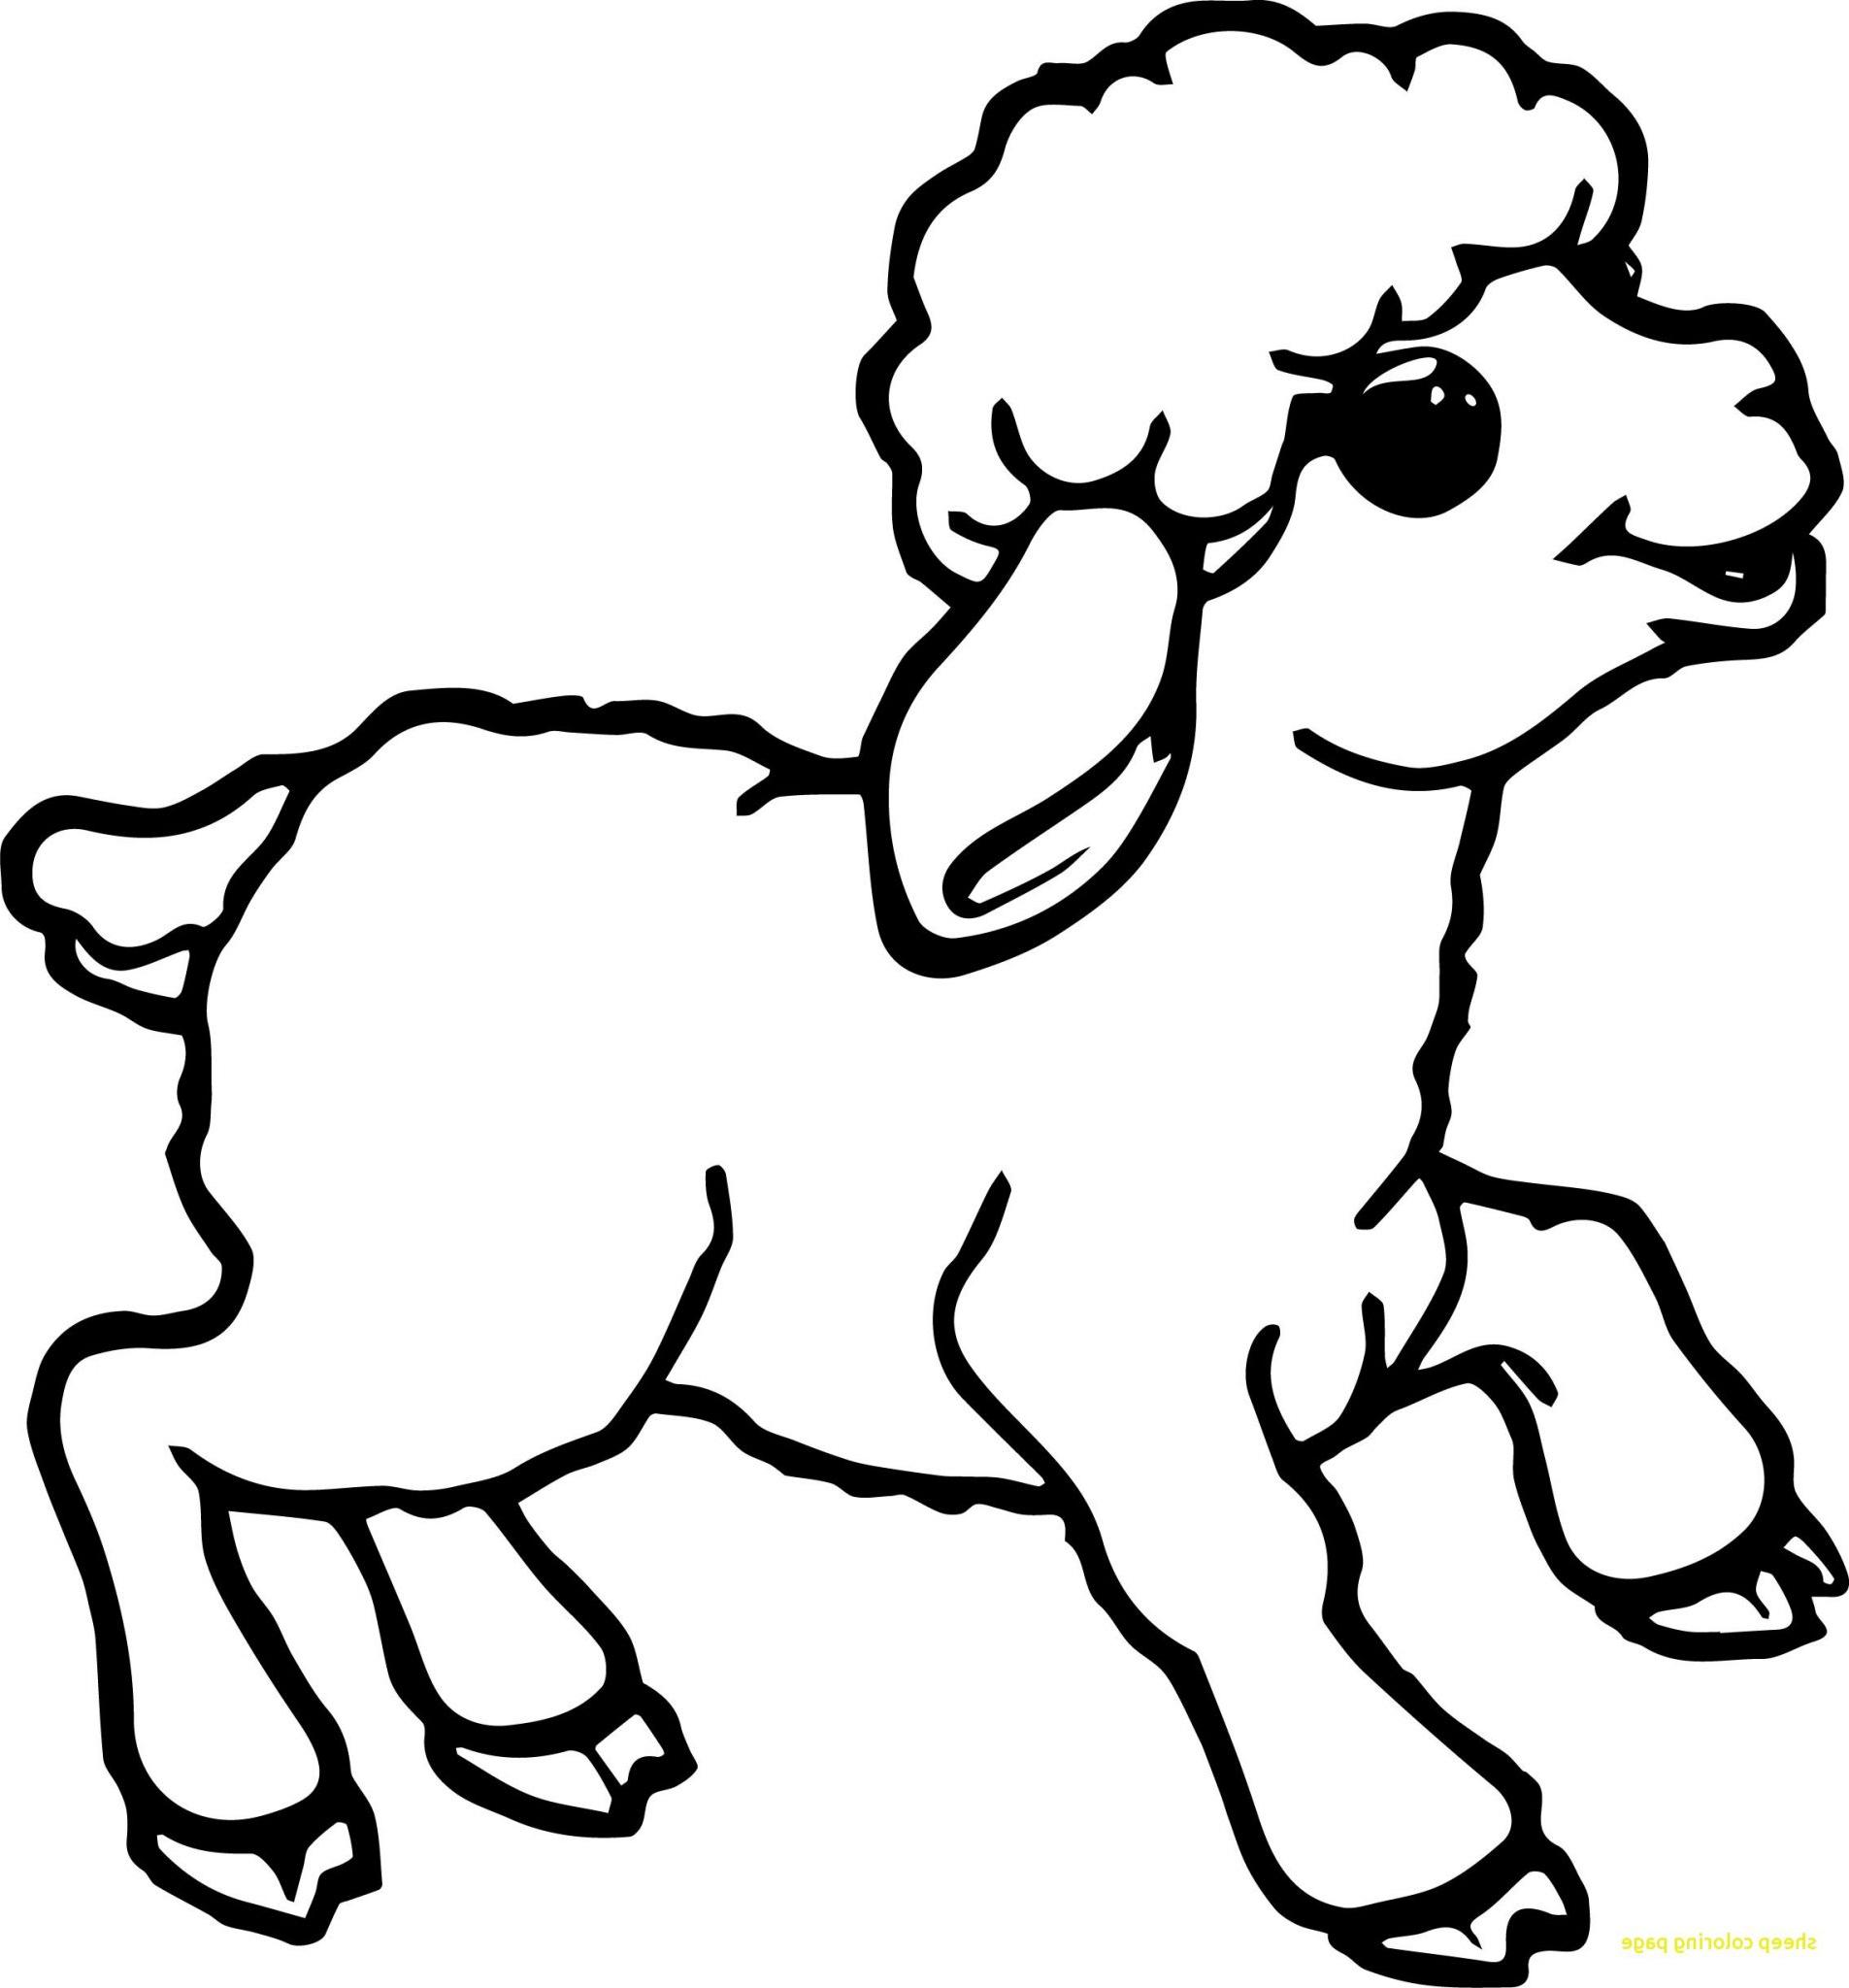 Gambar Domba Kartun Berwarna   Tentang Kolam Kandang Ternak pertaining to Gambar Domba Animasi